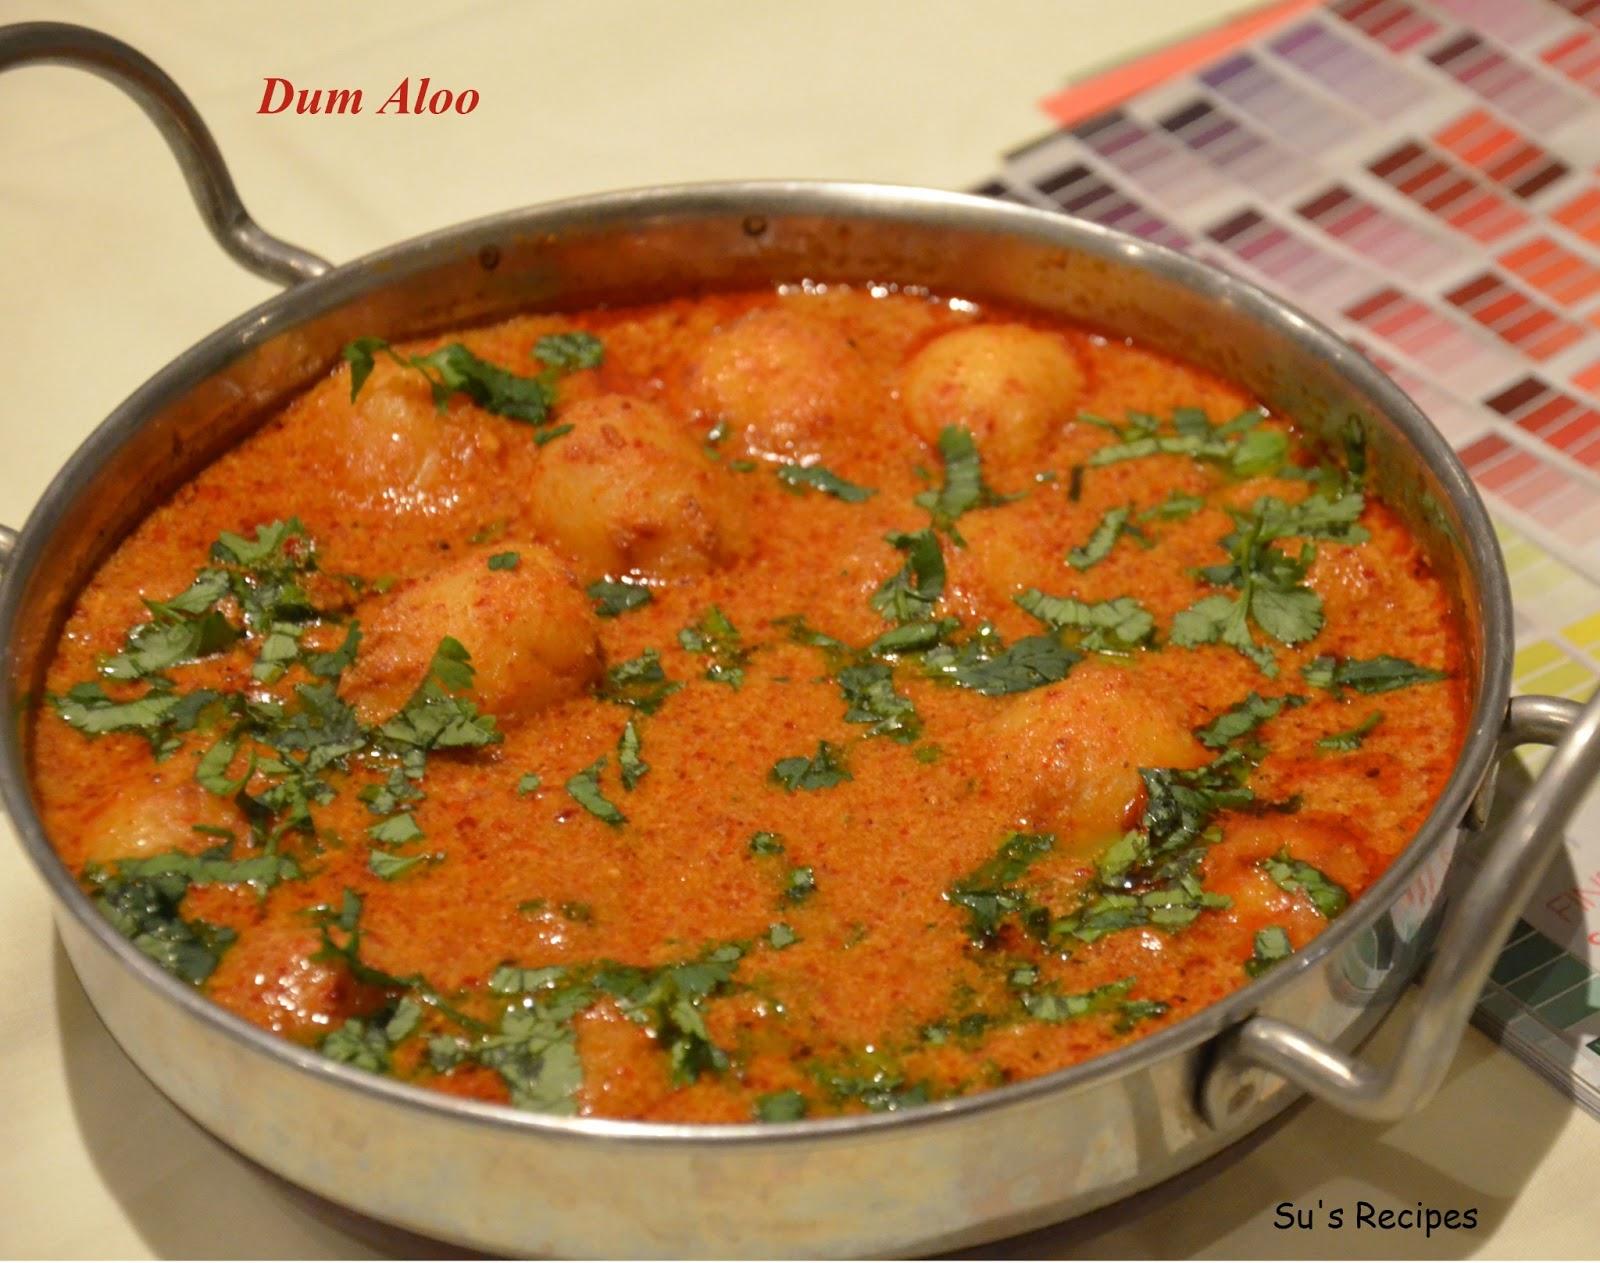 Su's Recipes: Dum Aloo (Potato Gravy)